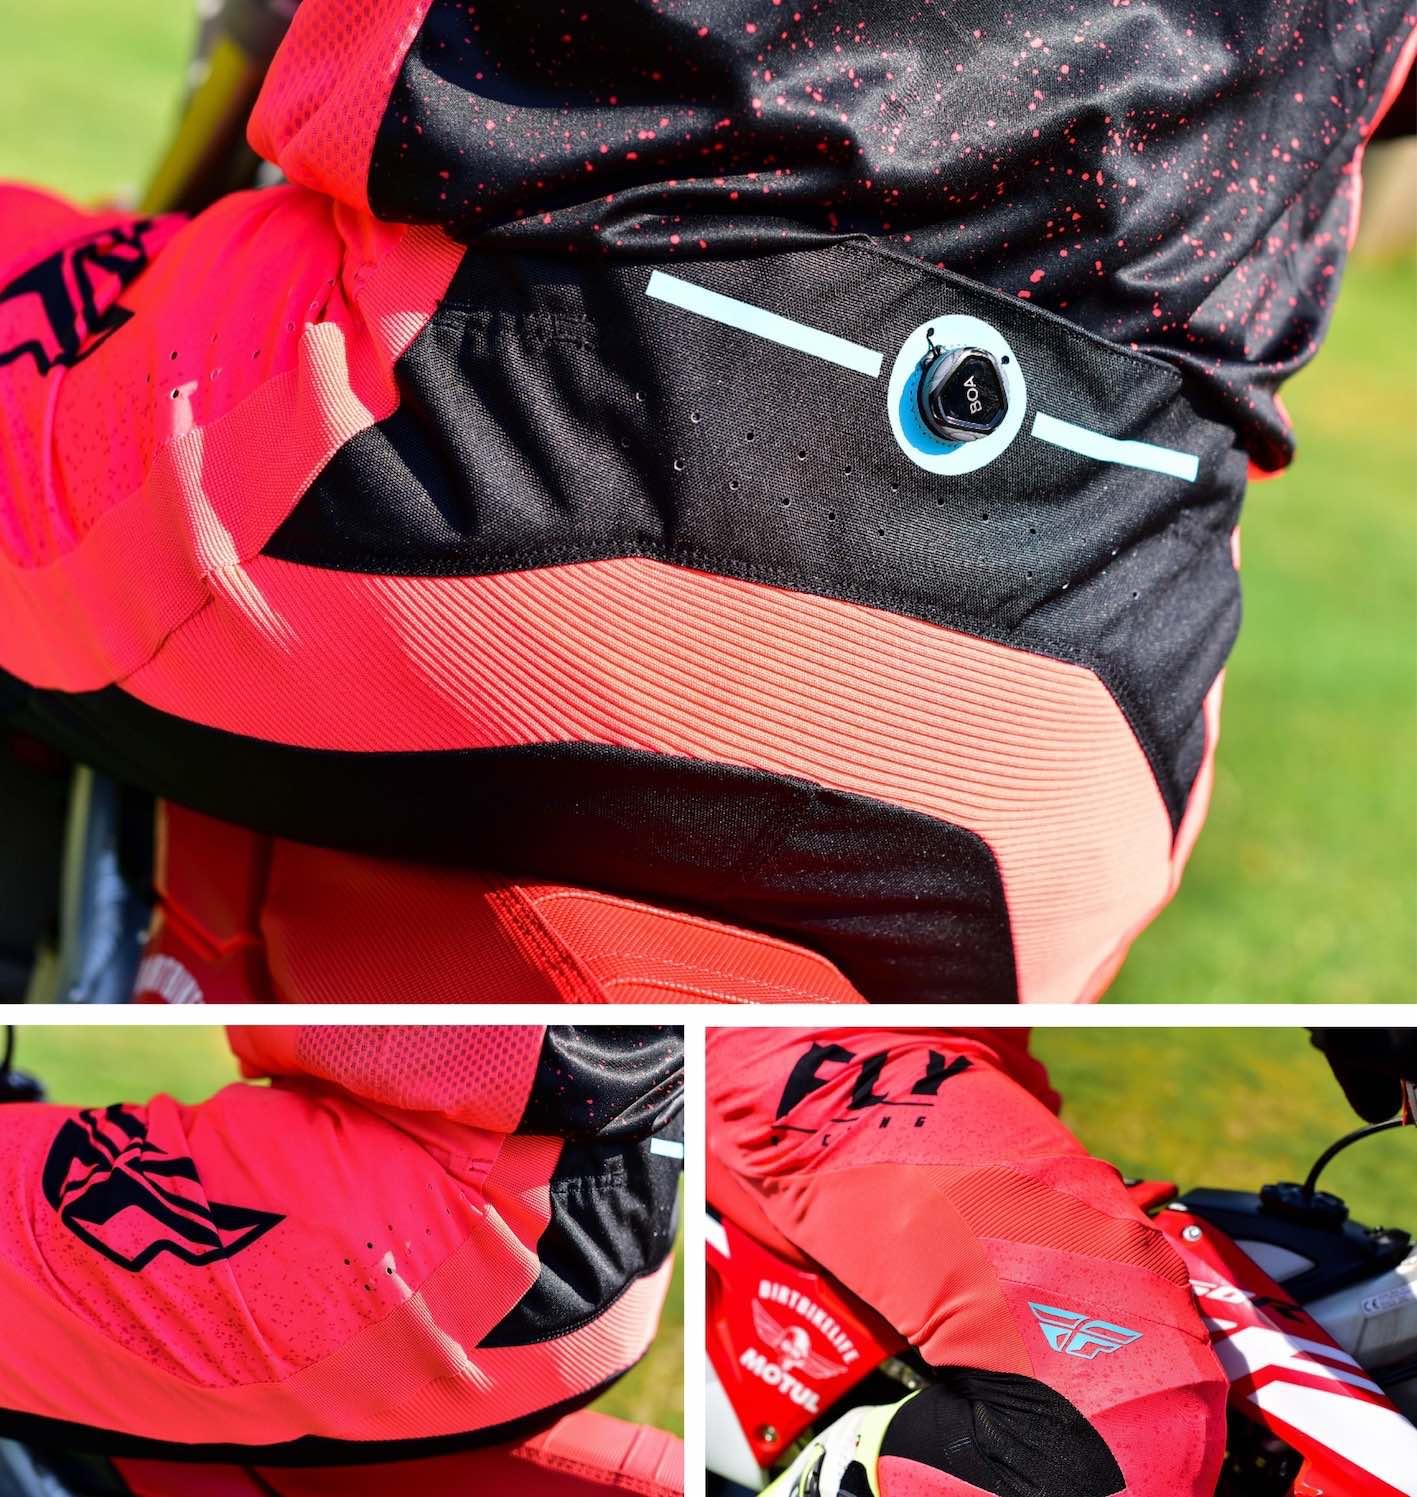 2020 Fly Lite Motocross Racewear pants features